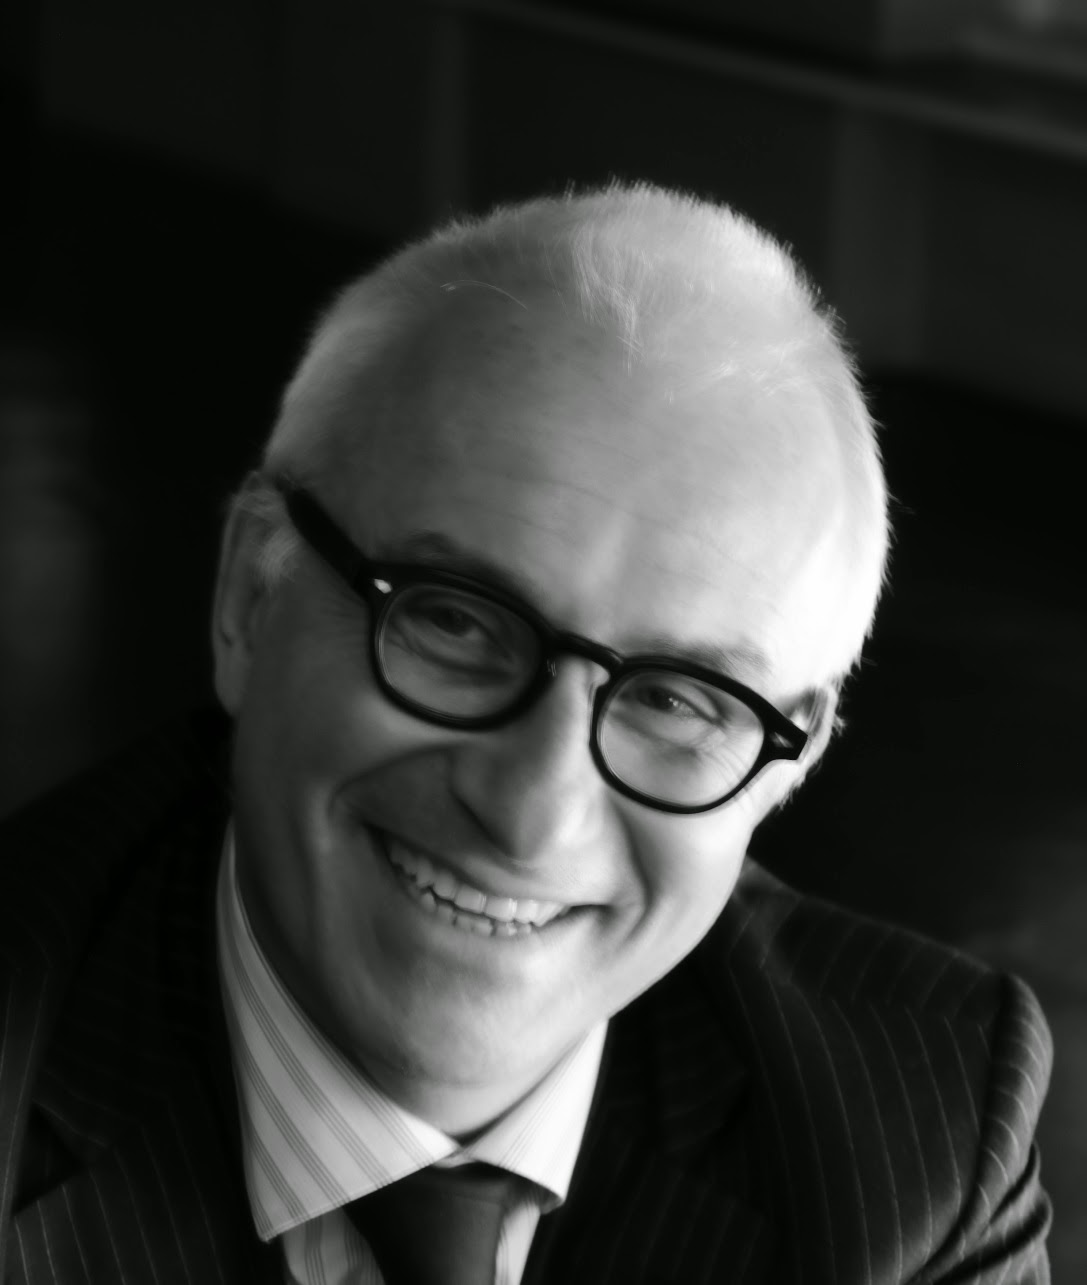 Roberto Spada